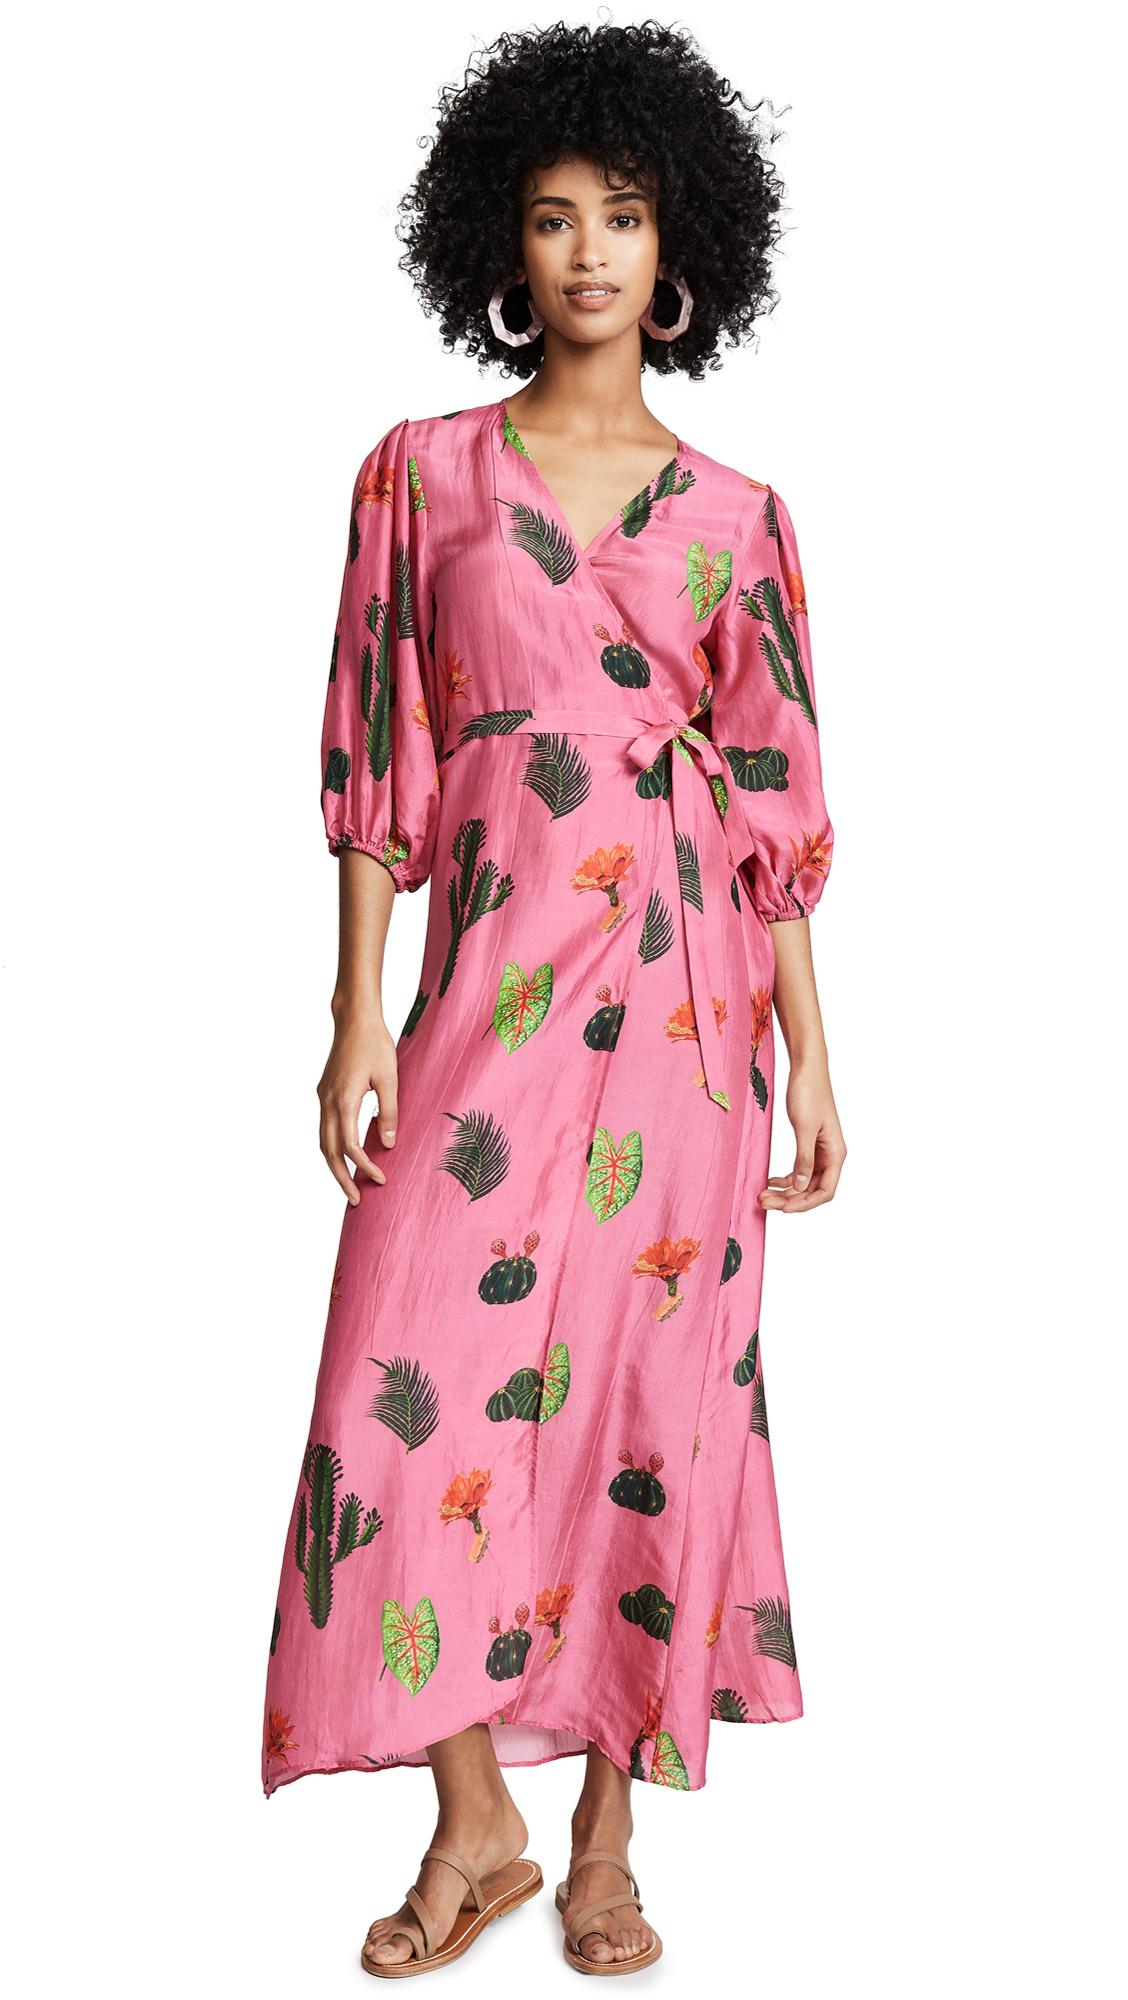 CAROLINA K Donna Dress in Cactus Pink